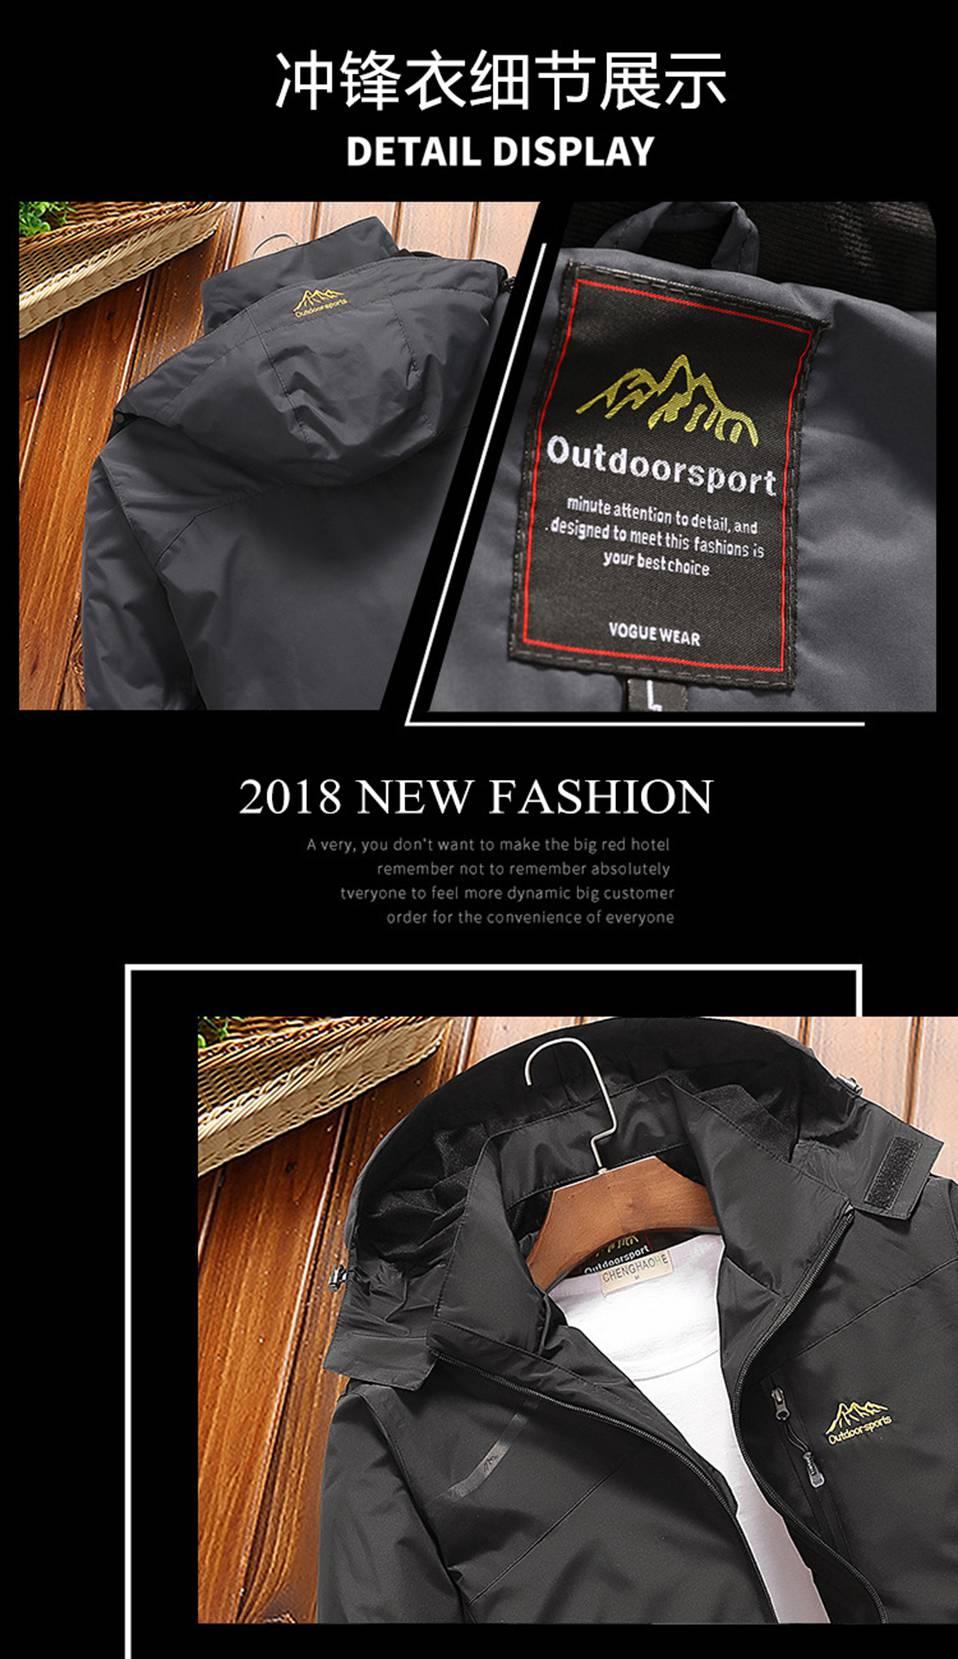 2019 Spring Autumn outdoor Sports Windbreaker Men Plus Size Camping Hiking Rain Waterproof Jacket SoftShell Fishing Coats 4XL (2)